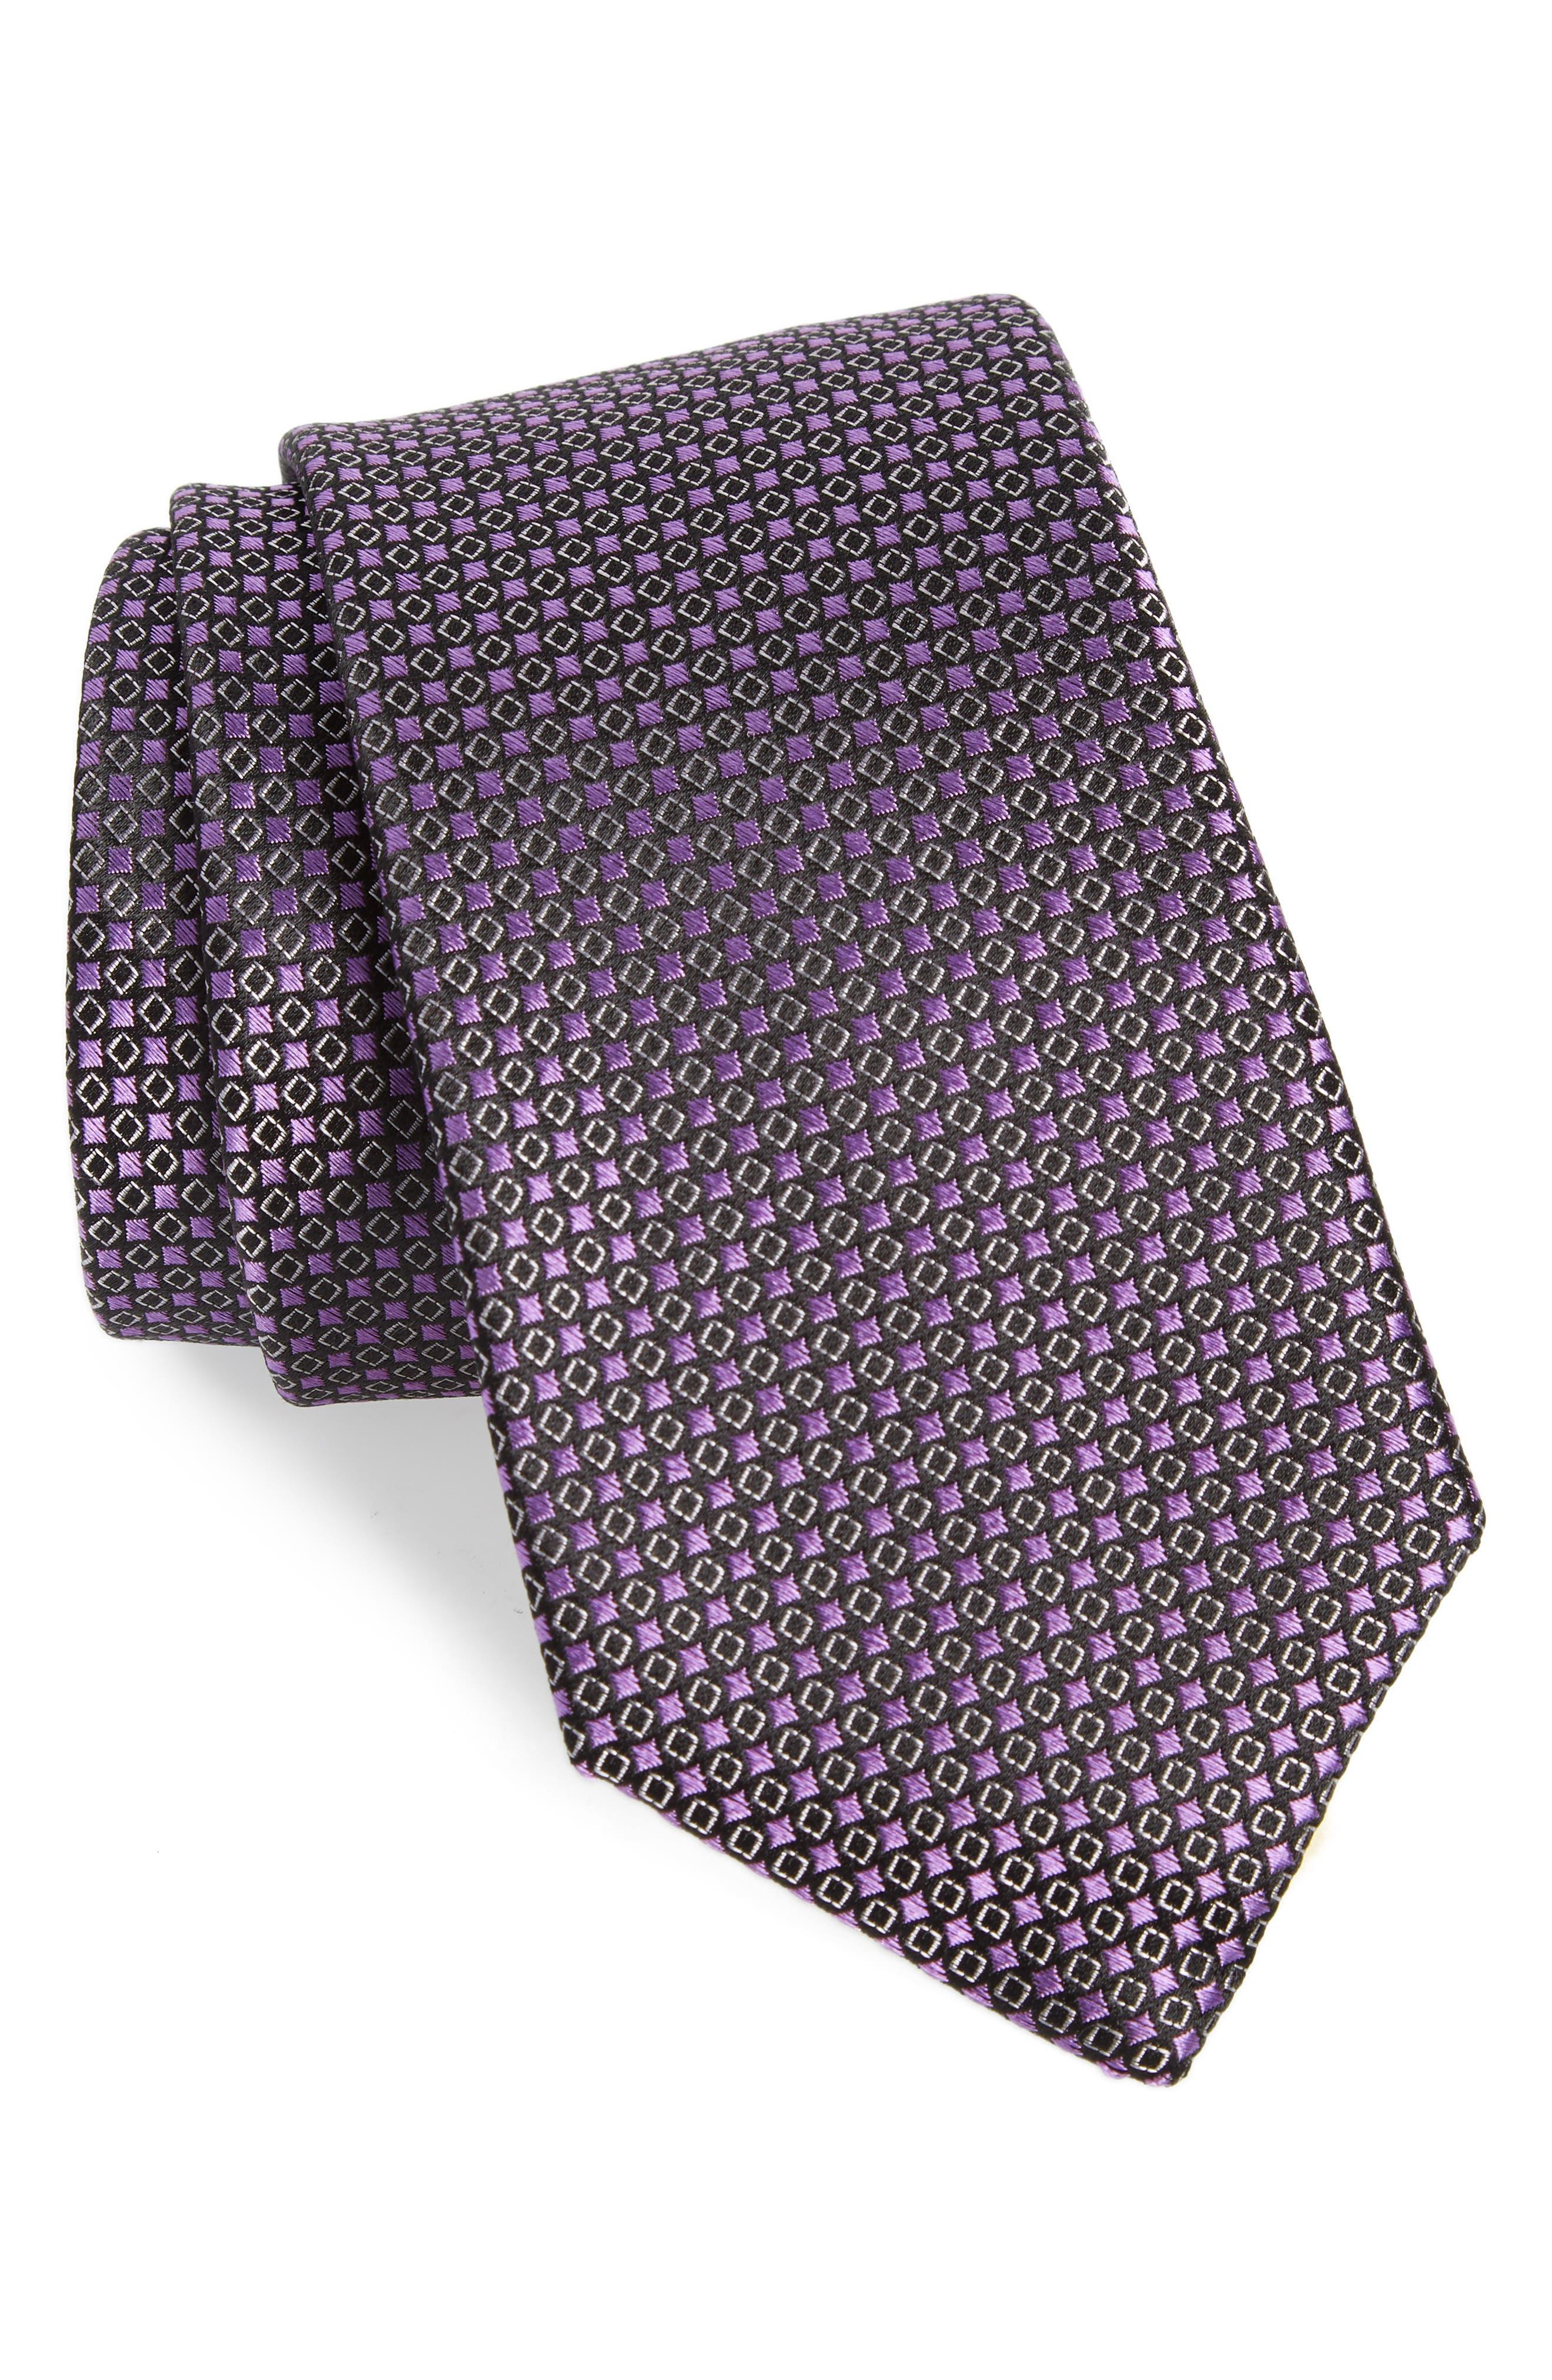 Chad Microdot Silk Tie,                             Main thumbnail 1, color,